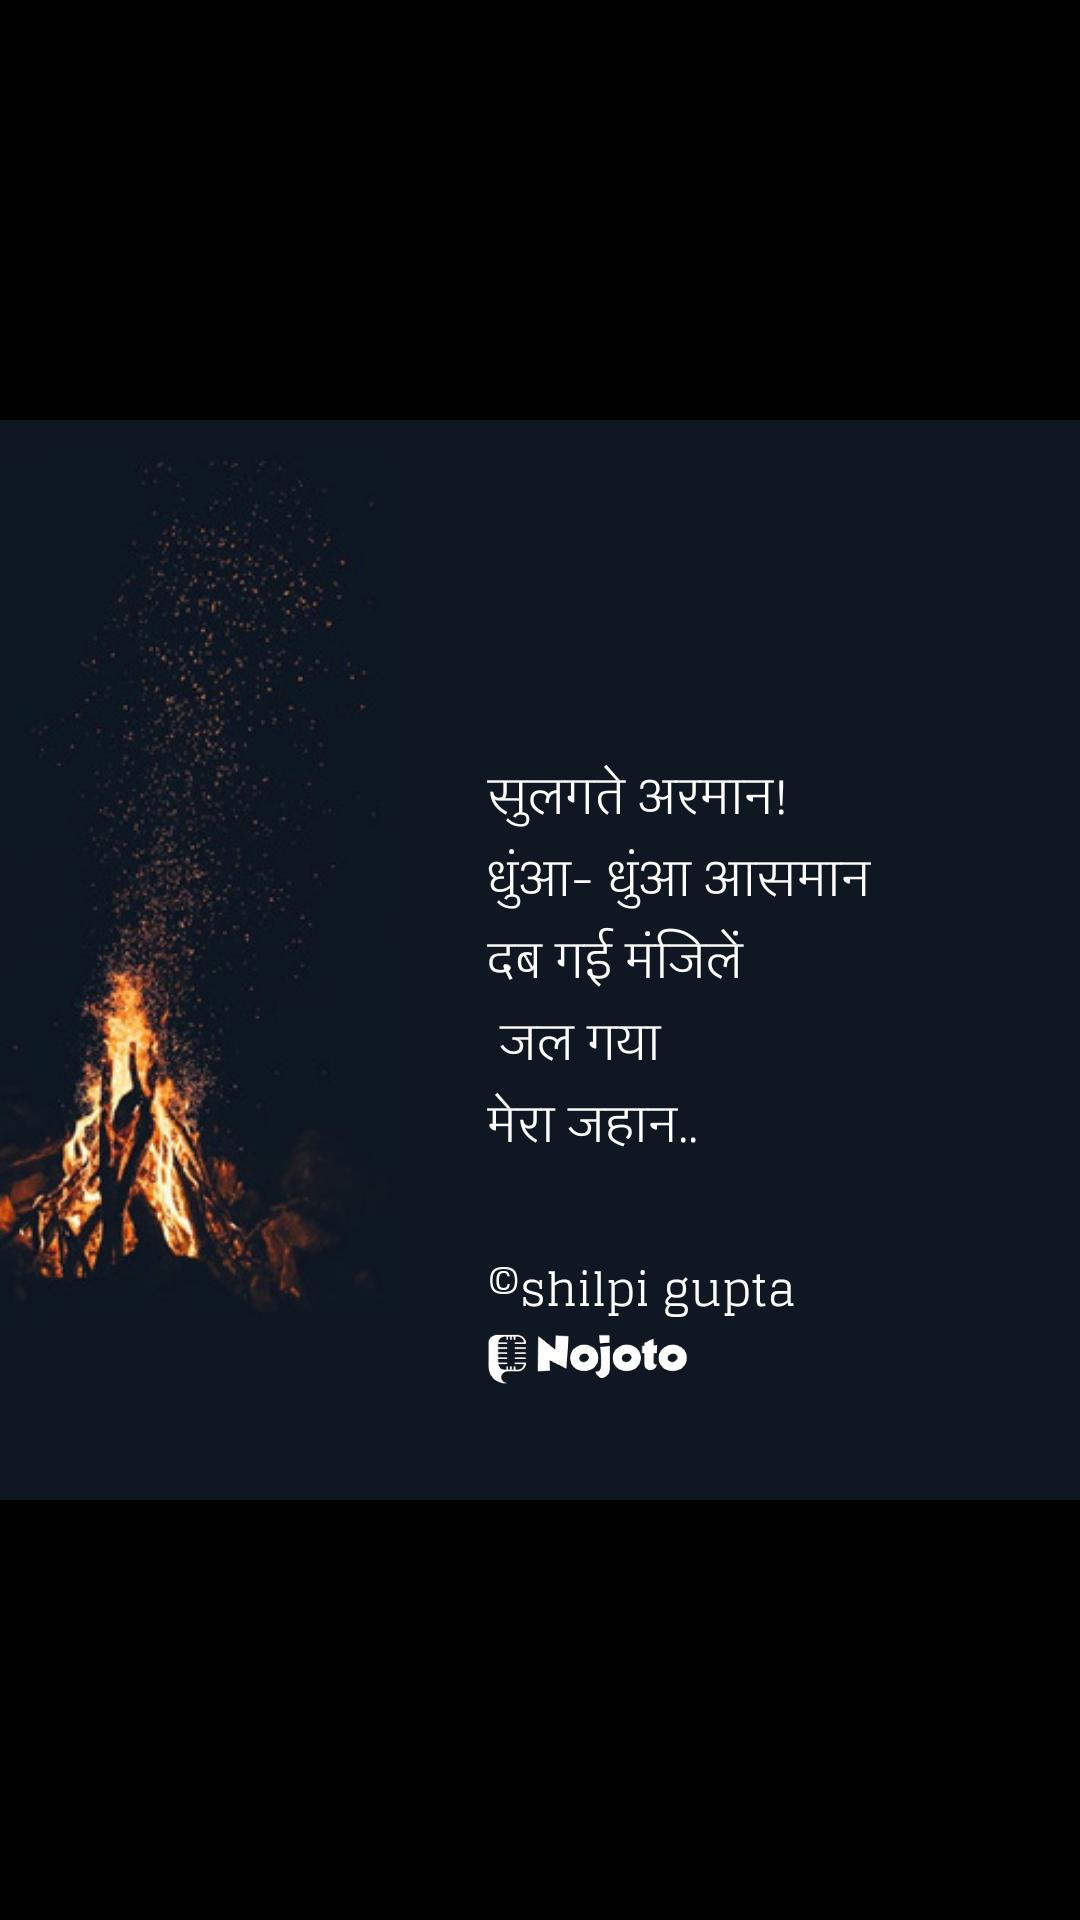 Jalan quotes सुलगते अरमान! धुंआ- धुंआ आसमान  दब गई मंजिलें   जल गया  मेरा जहान..  ©shilpi gupta